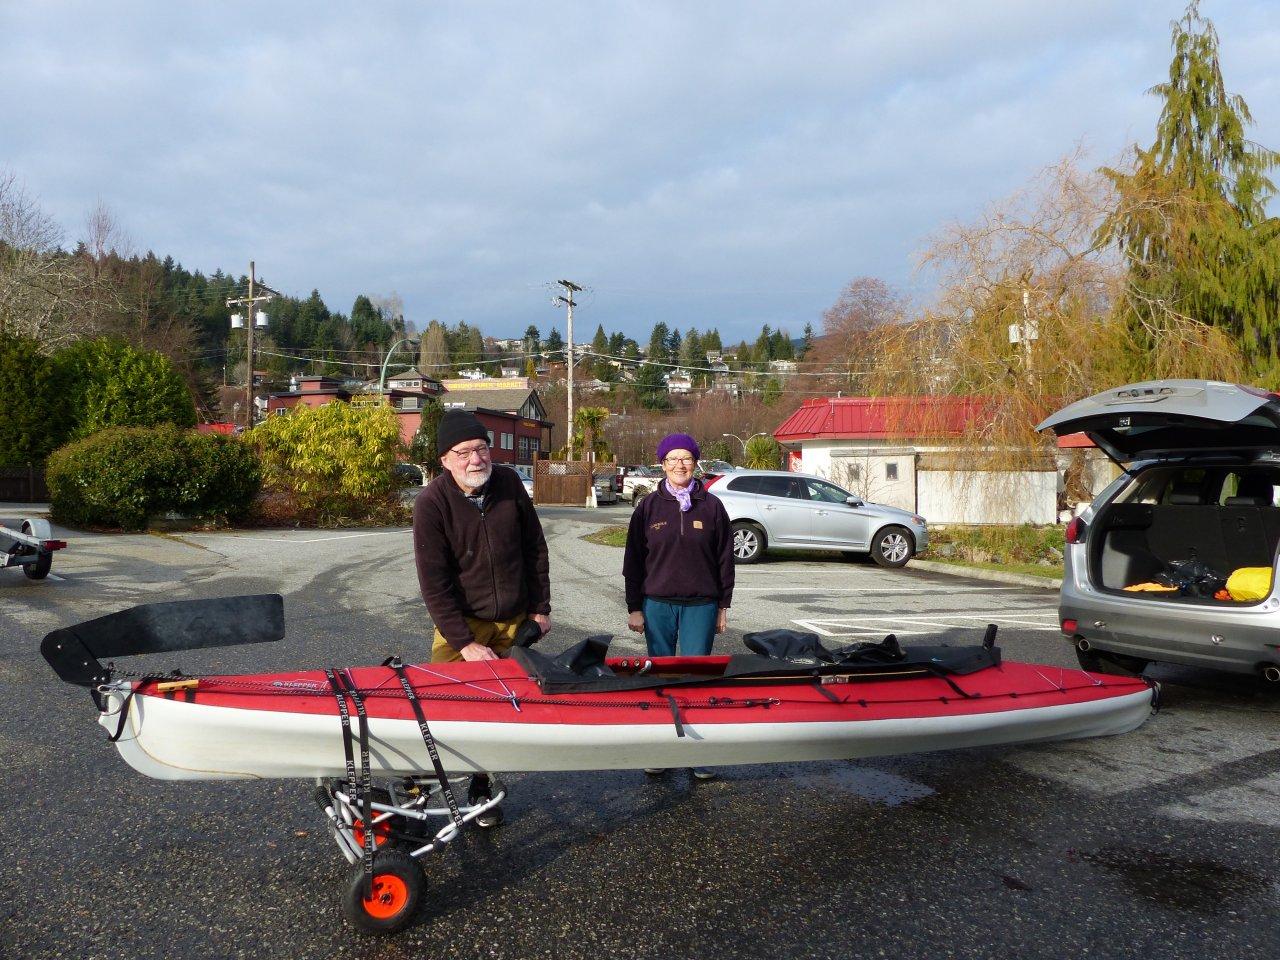 P1010241 kayak copy.jpg